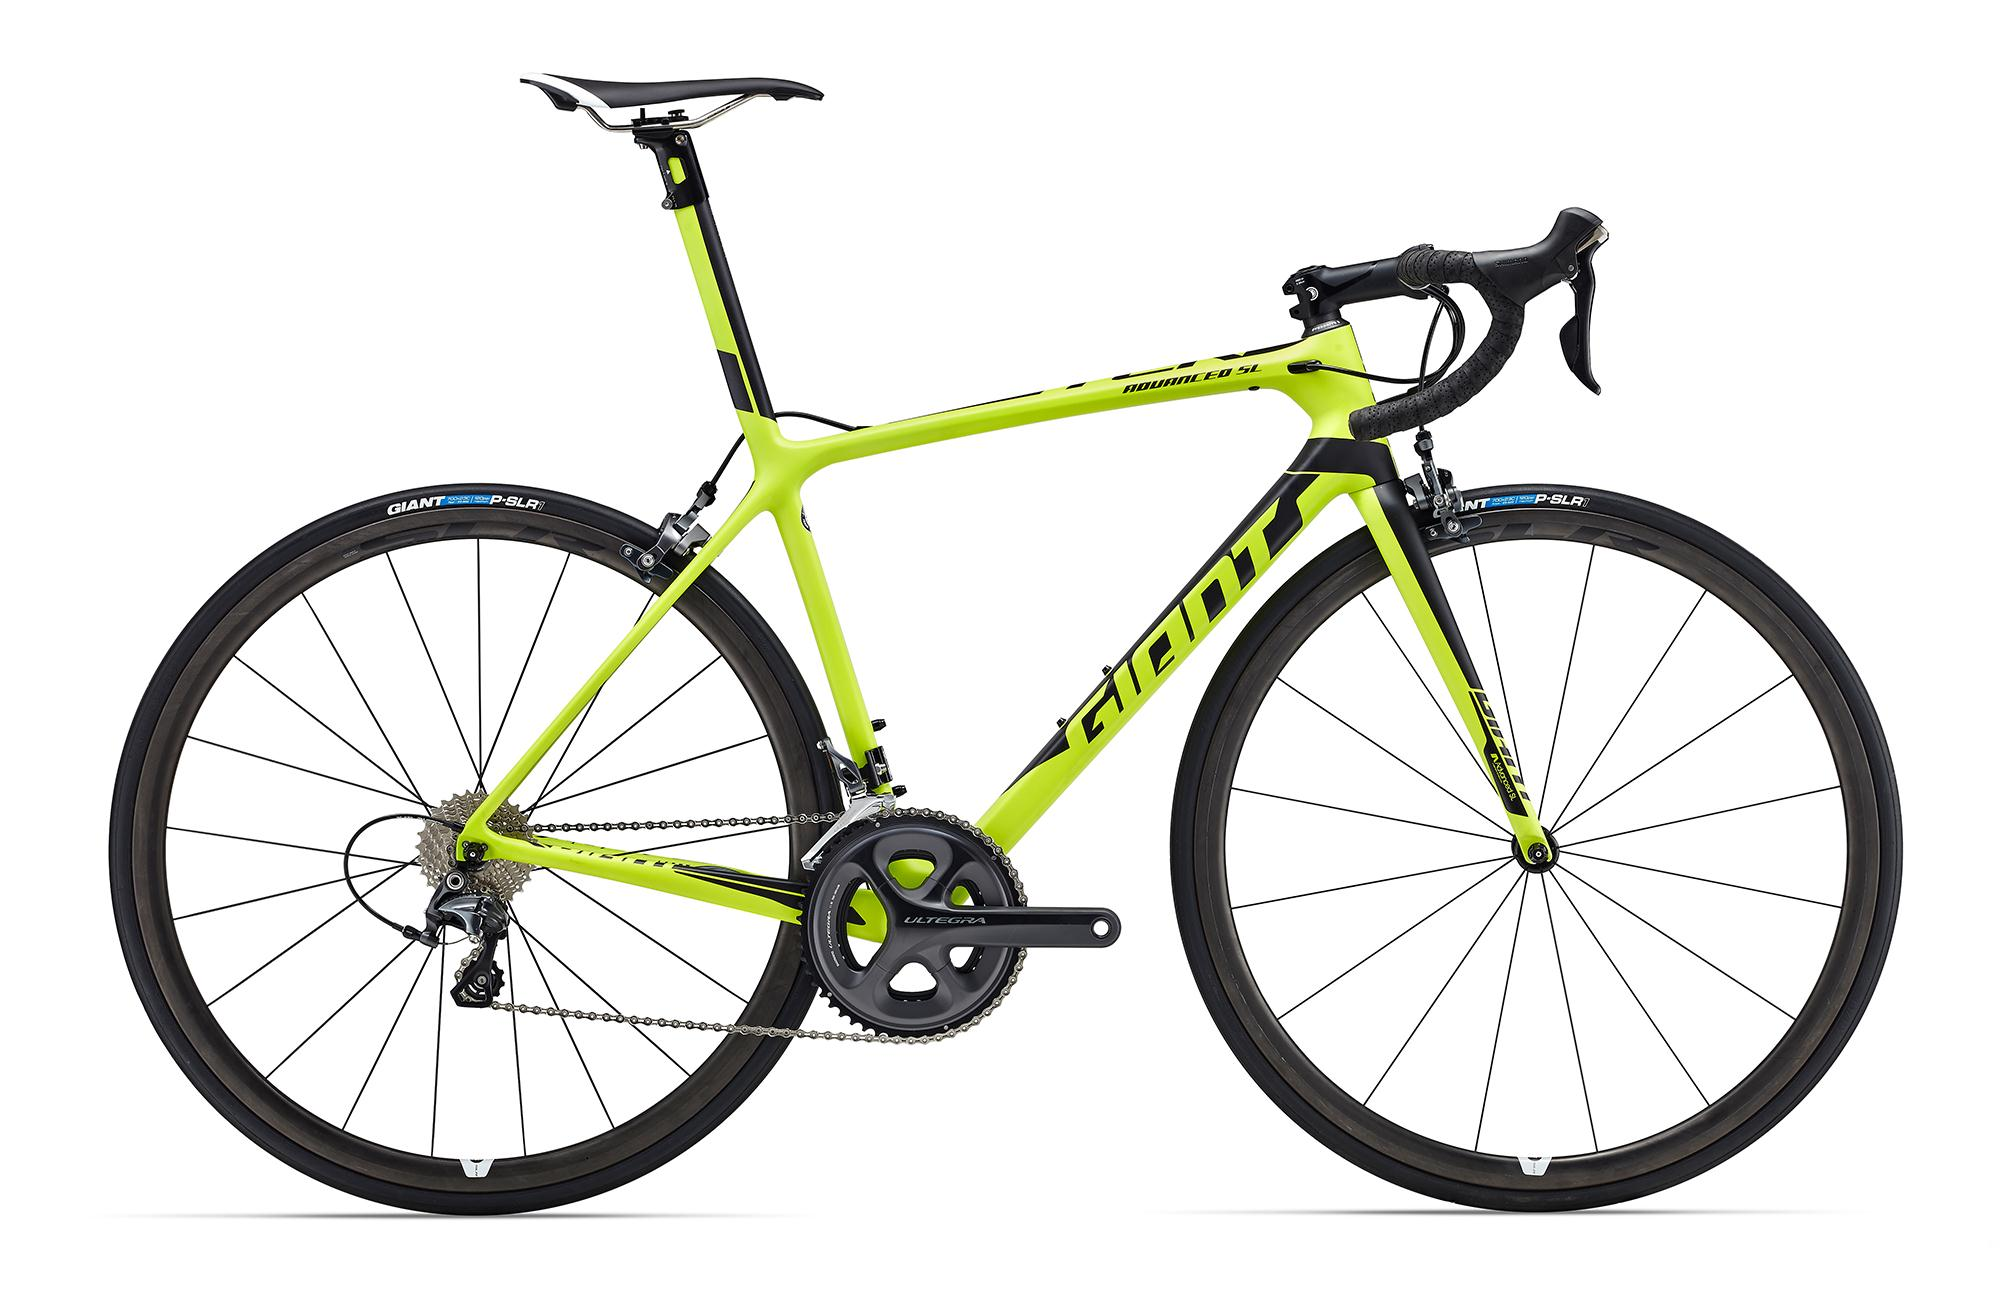 2016 Giant TCR Advanced SL 2 Carbon Road Race Bike £2,399 20